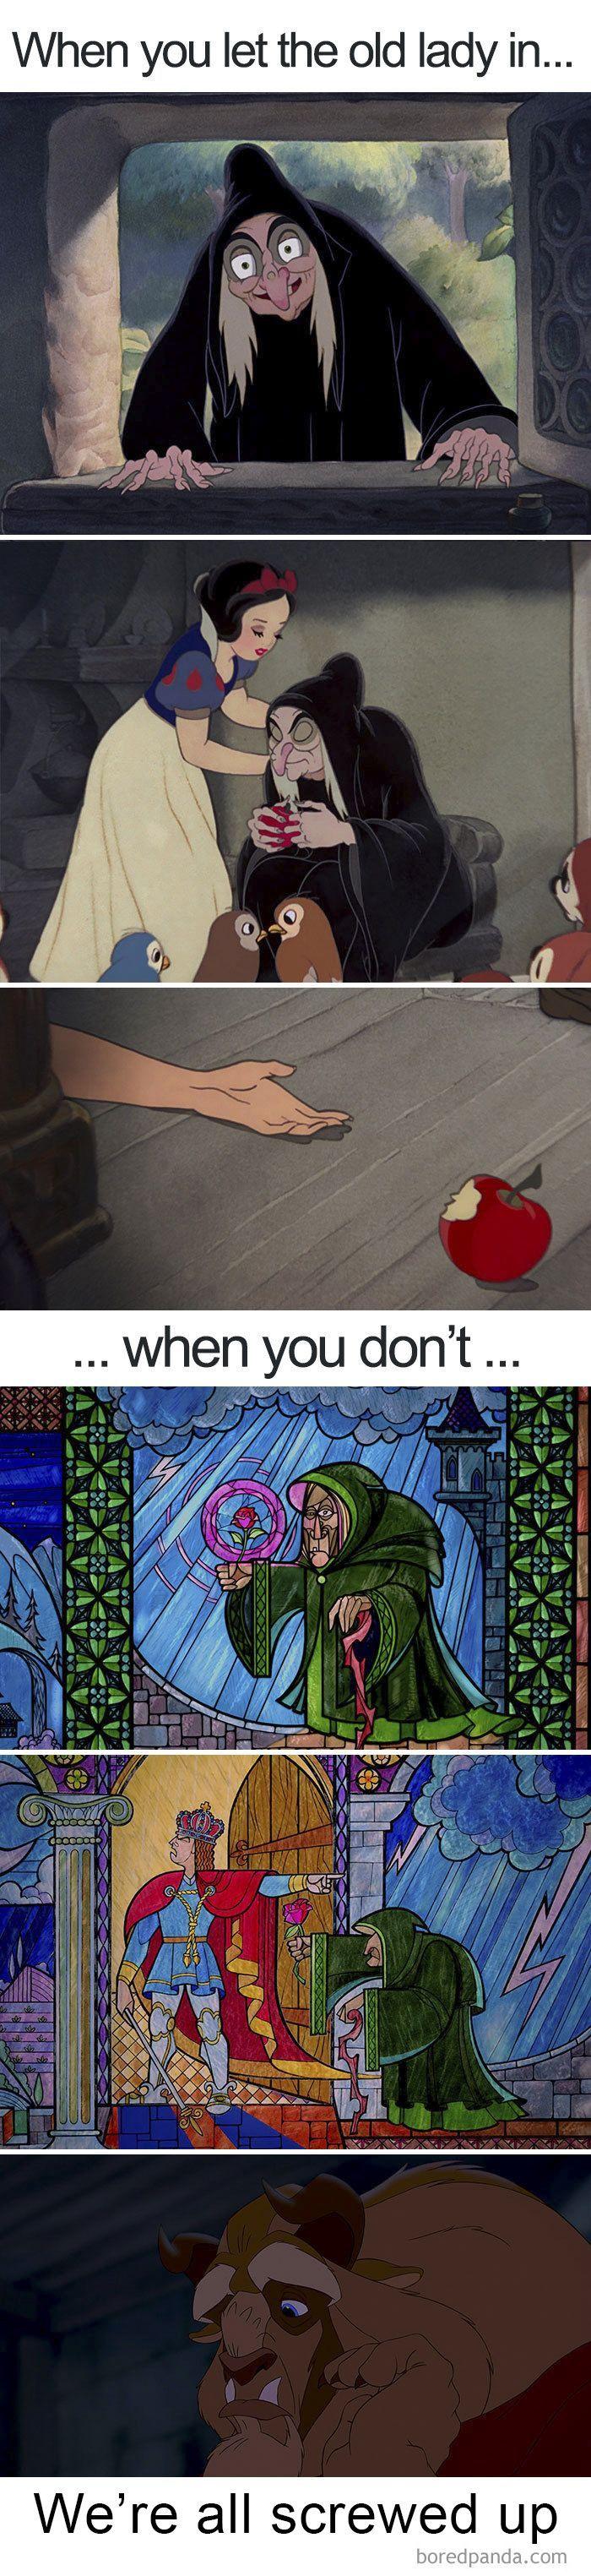 Funny-Disney-Memes #disneypixar